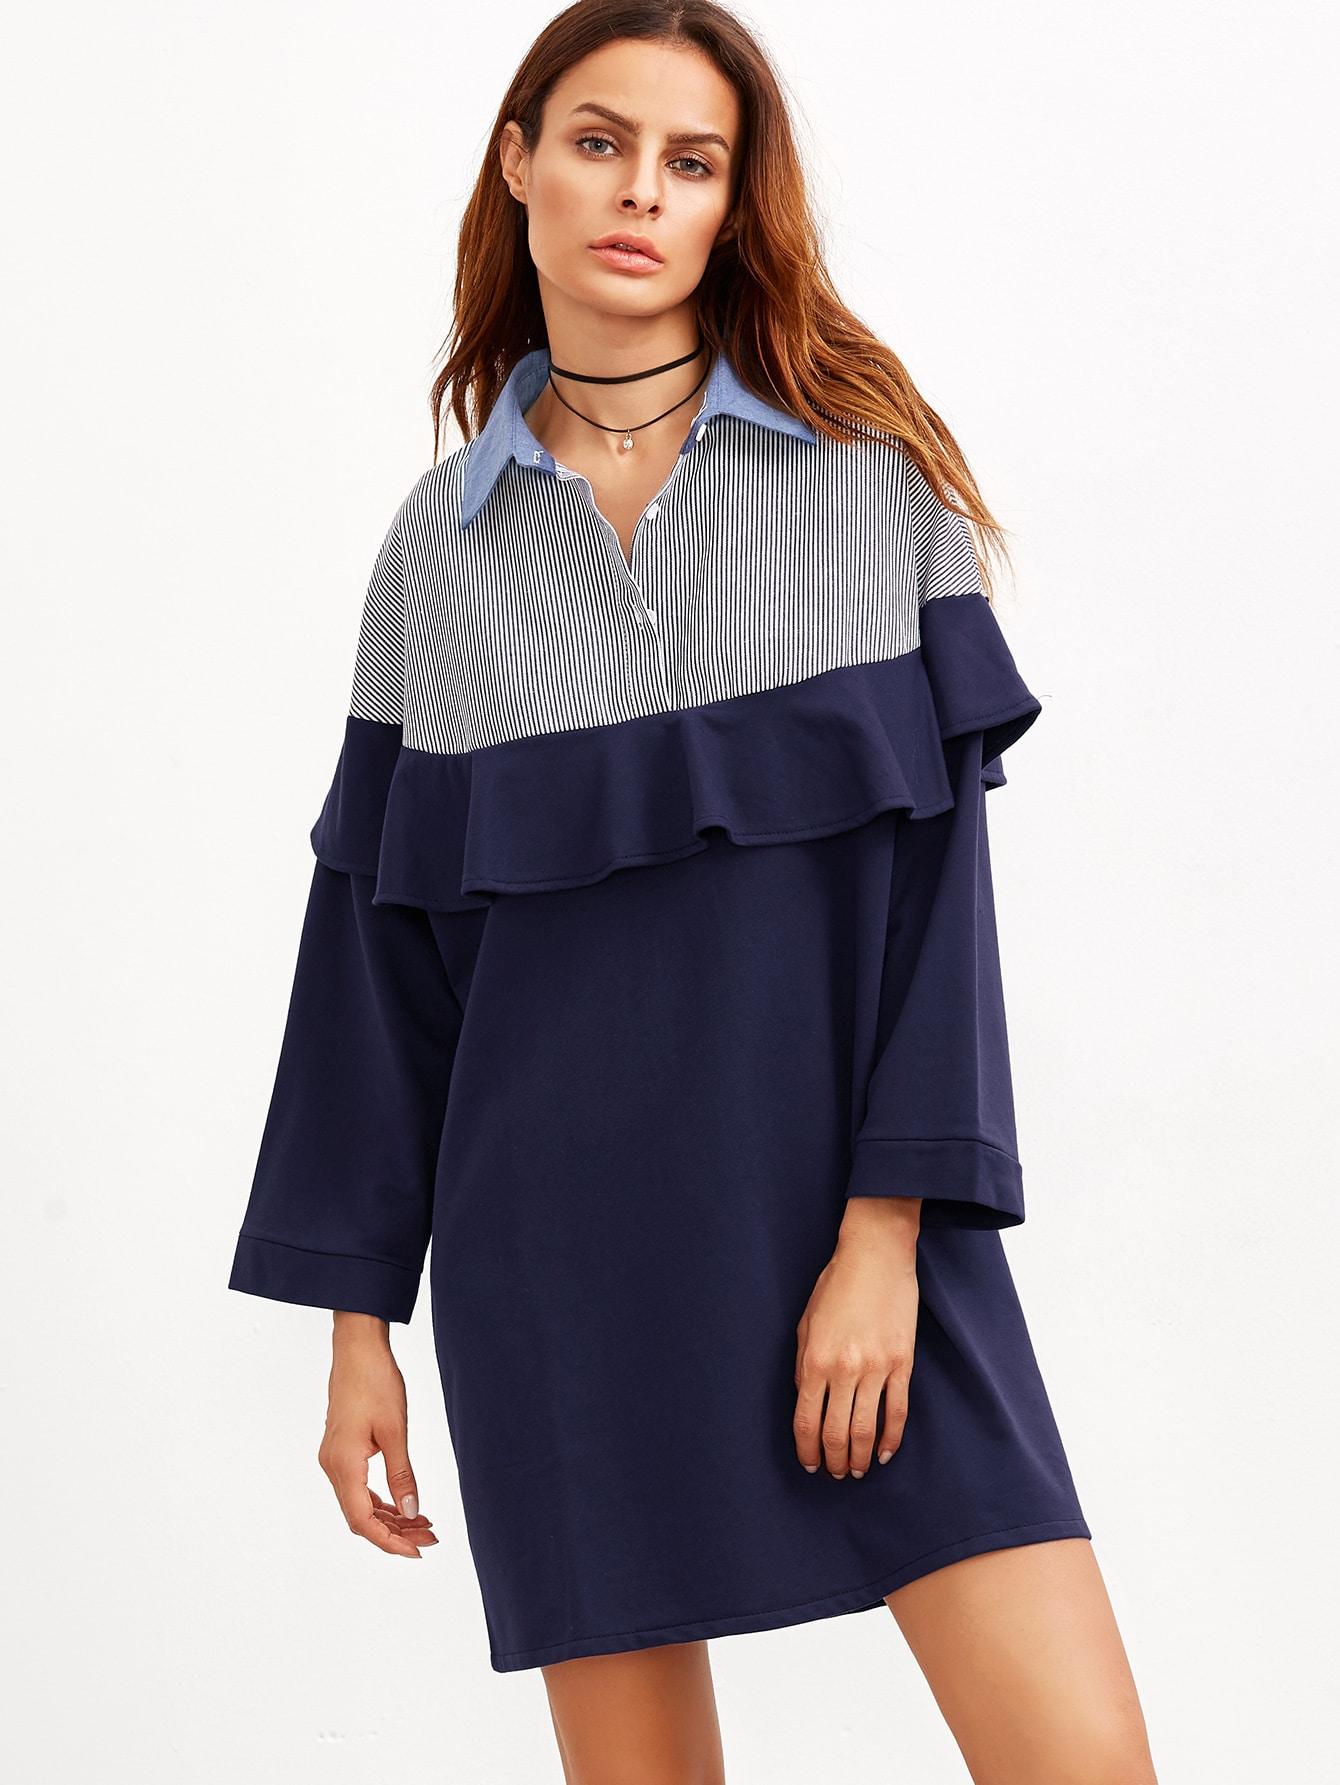 Contrast vertical striped ruffle trim shirt dress shein for Vertical striped dress shirt